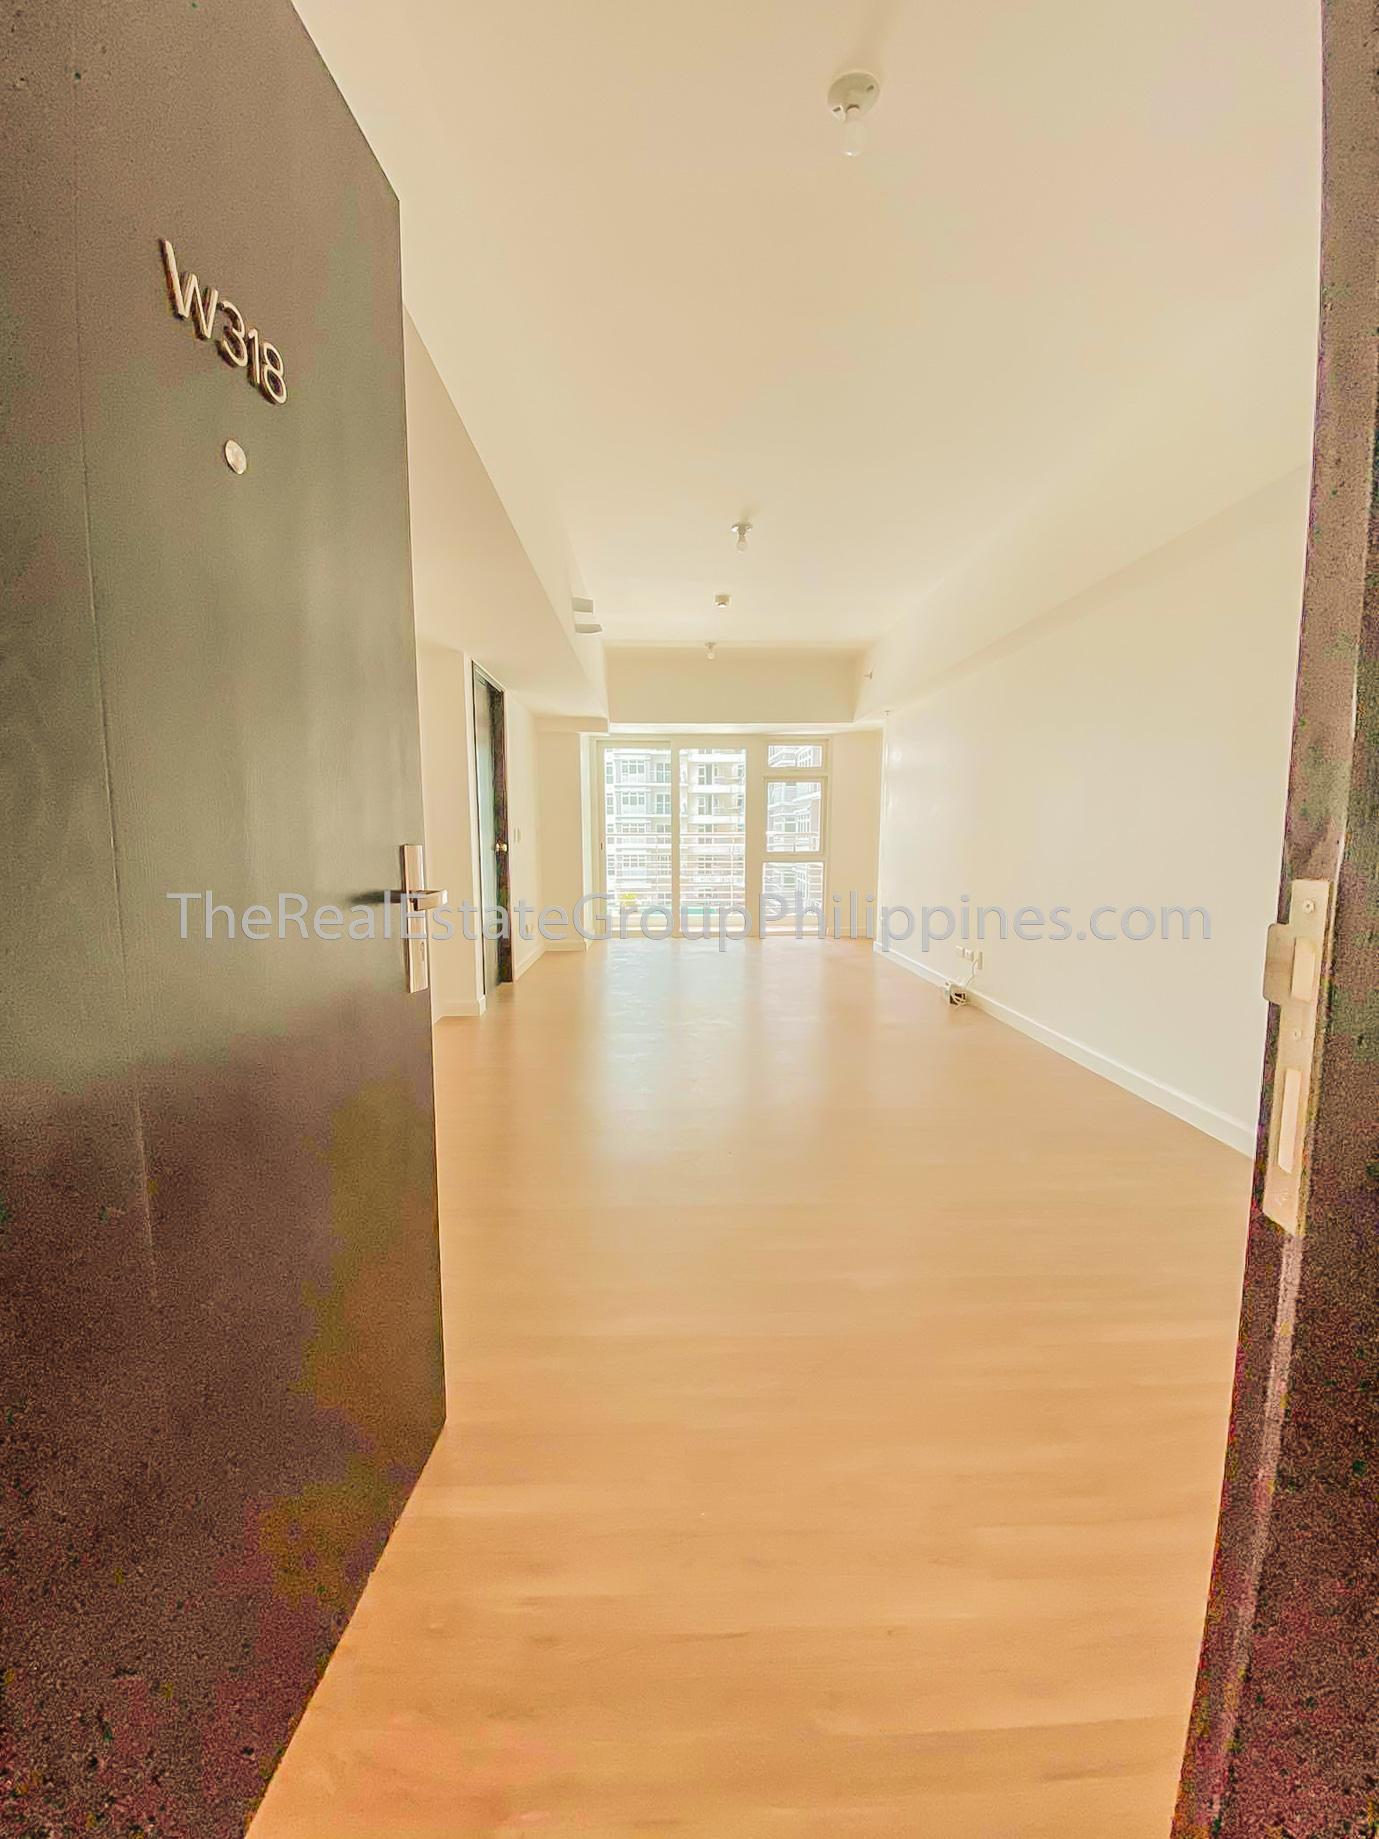 1BR Condo For Rent Lease The Veranda Arca South (3 of 12)